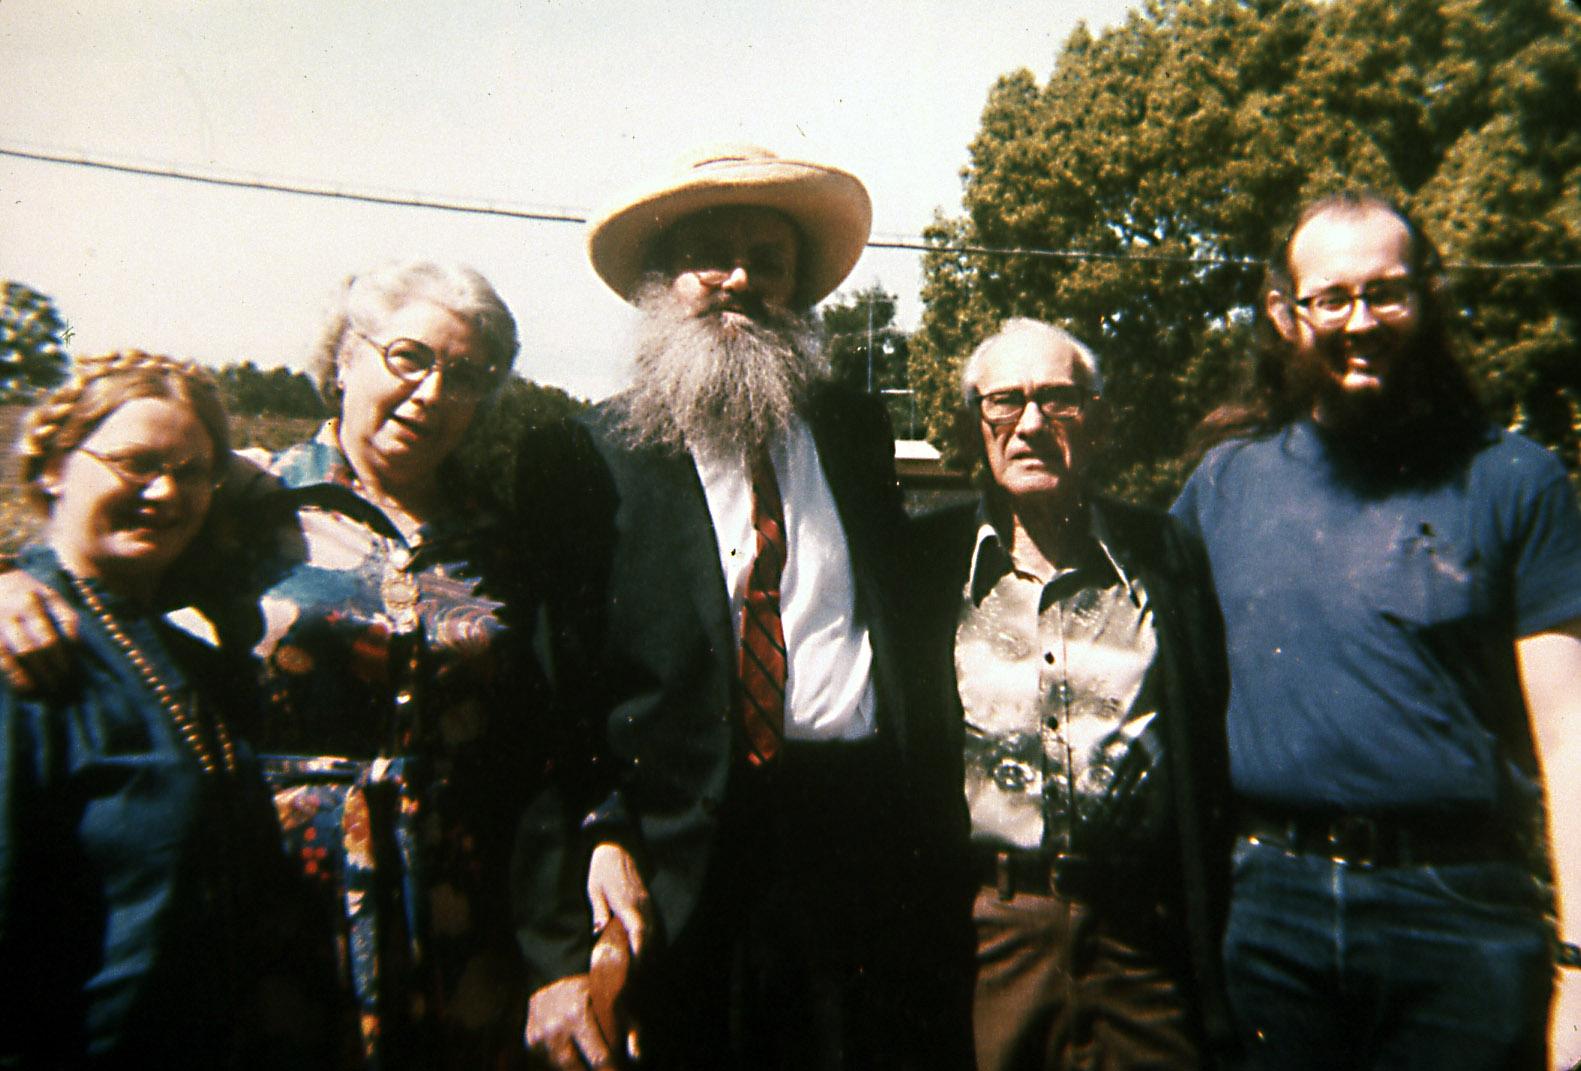 grady mcmurtry regardie william heidrick and 1975 grady mcmurtry regardie william heidrick and others 2